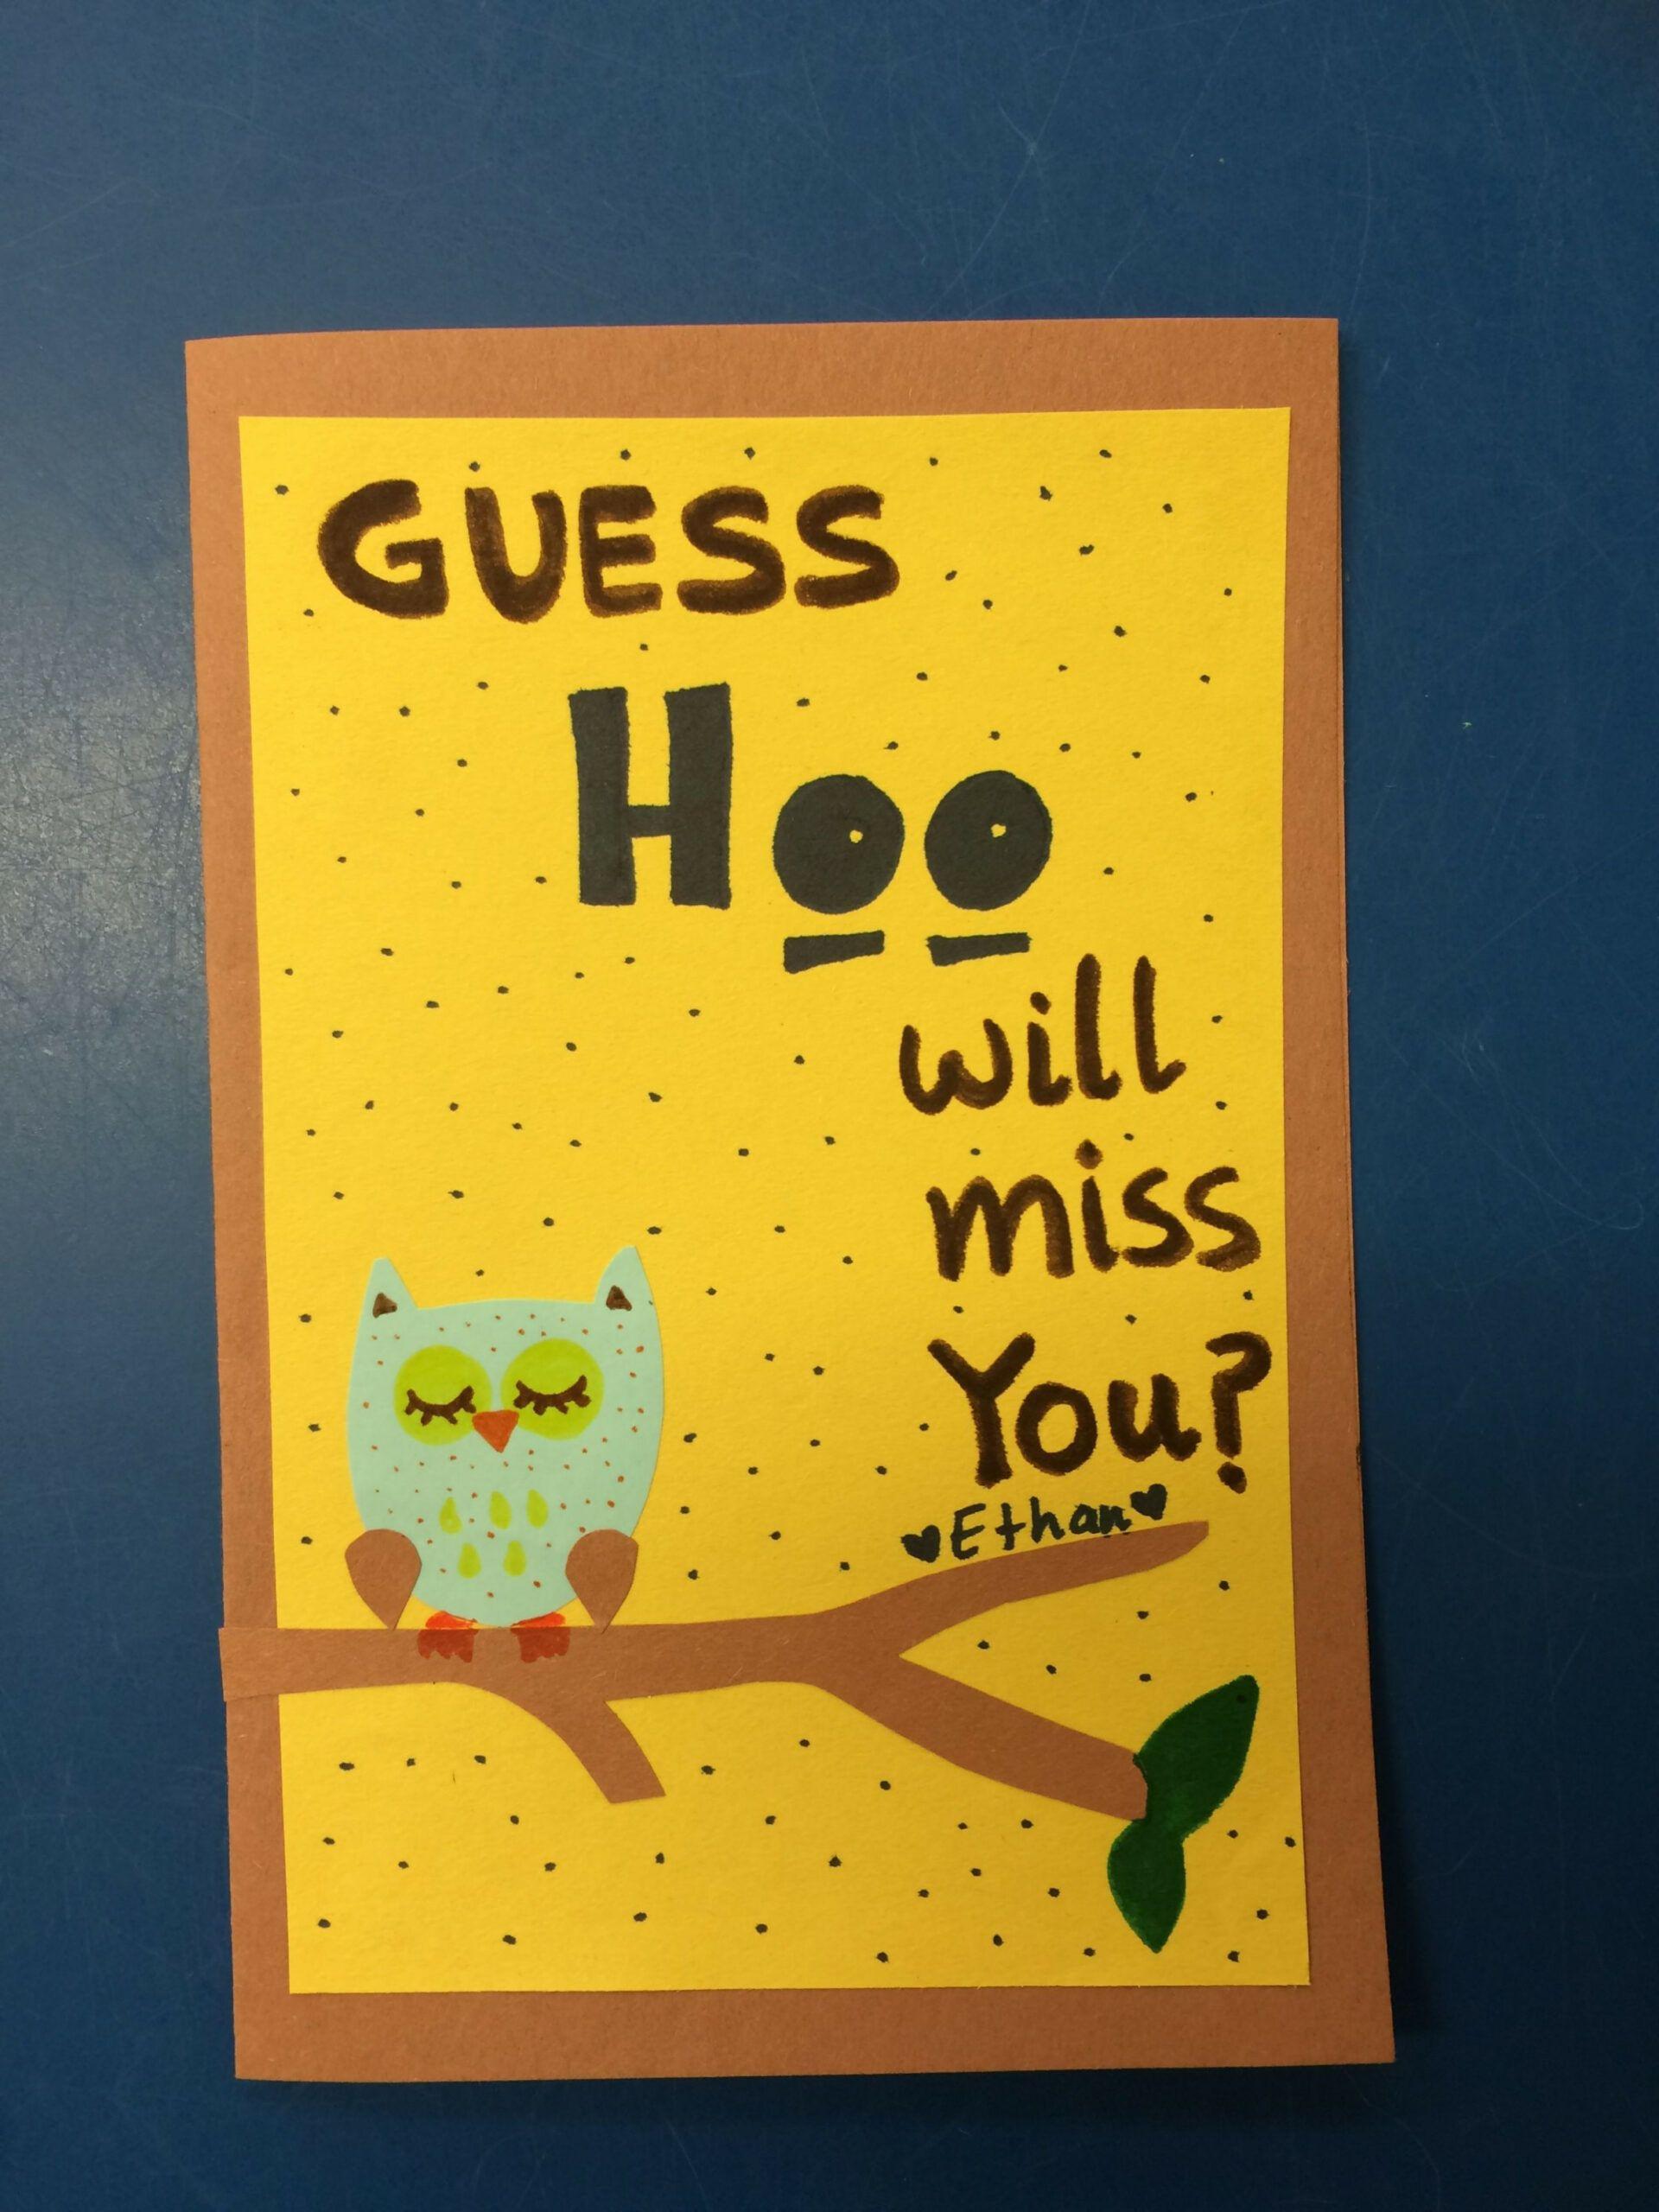 Farewell Cards For Preschoolers Teacher Cards Farewell Teacher Cards Farewell Cards Miss You Cards